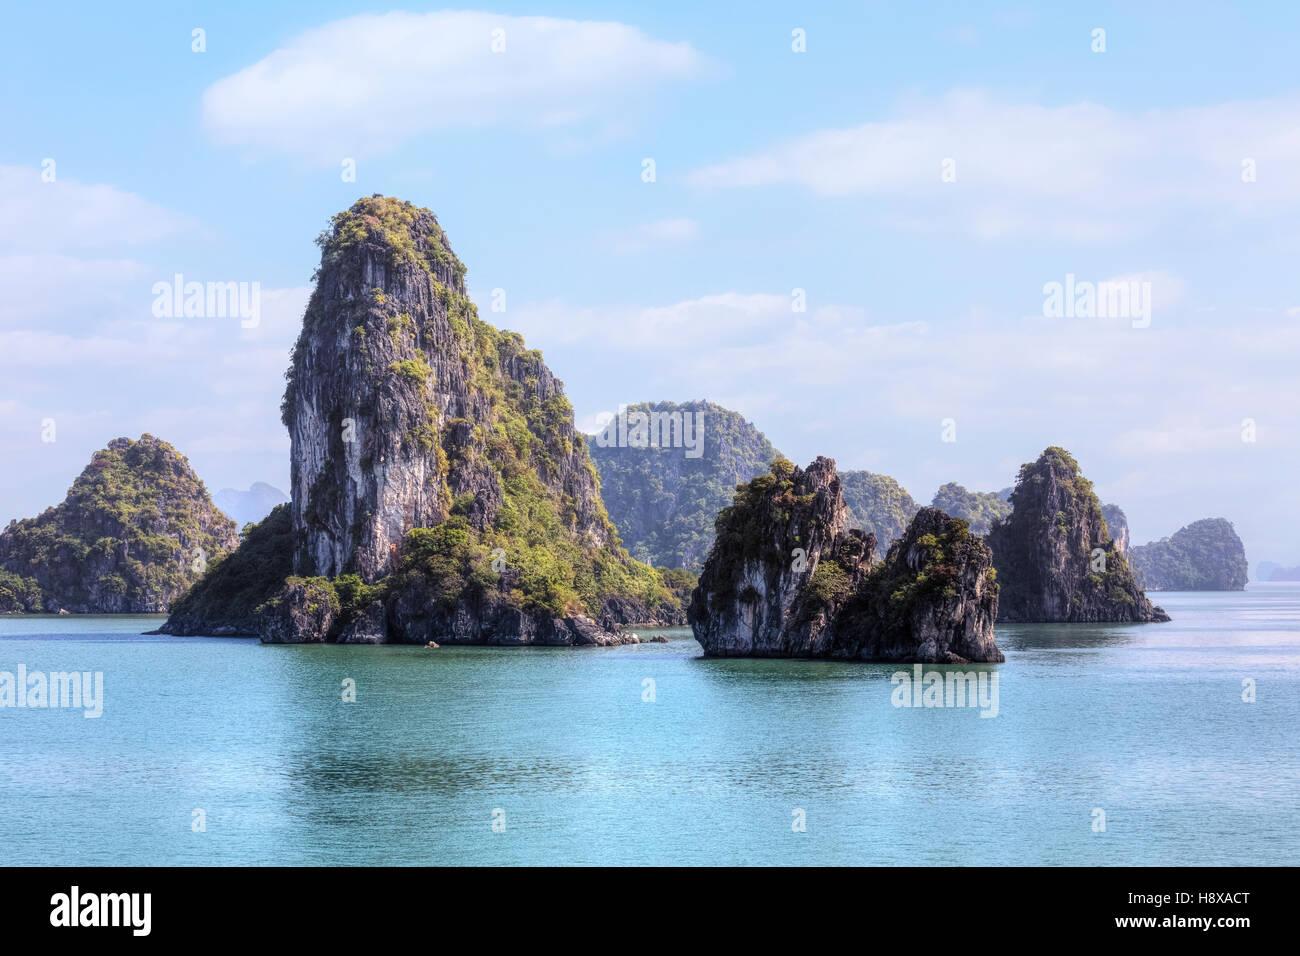 Halong Bay, Vietnam, Indochina, Asia - Stock Image